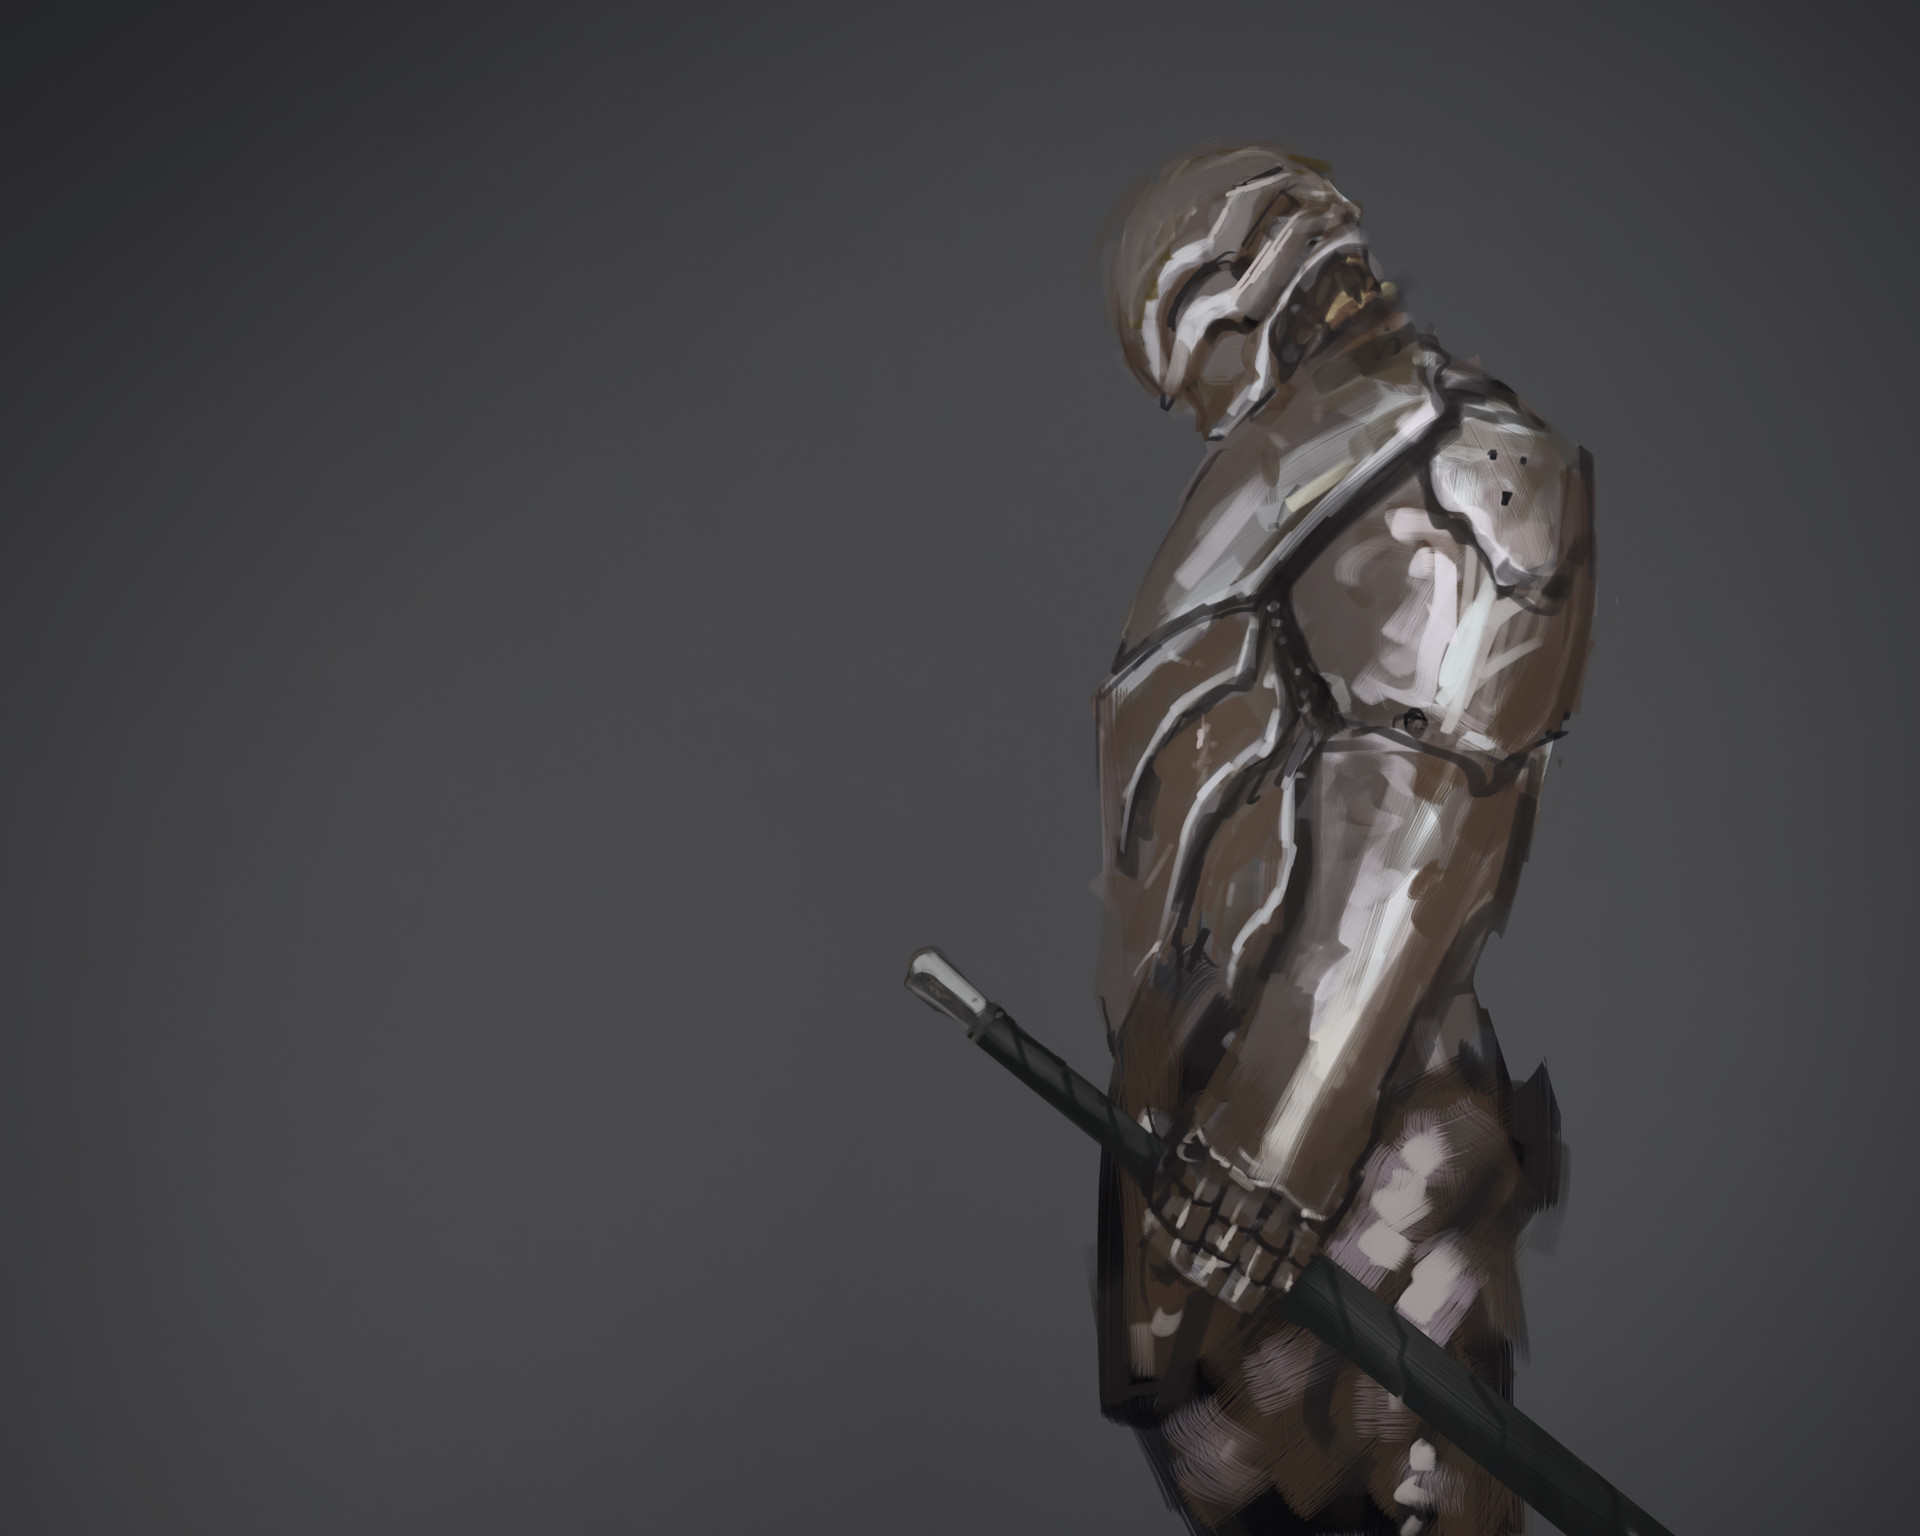 Benedick bana knight